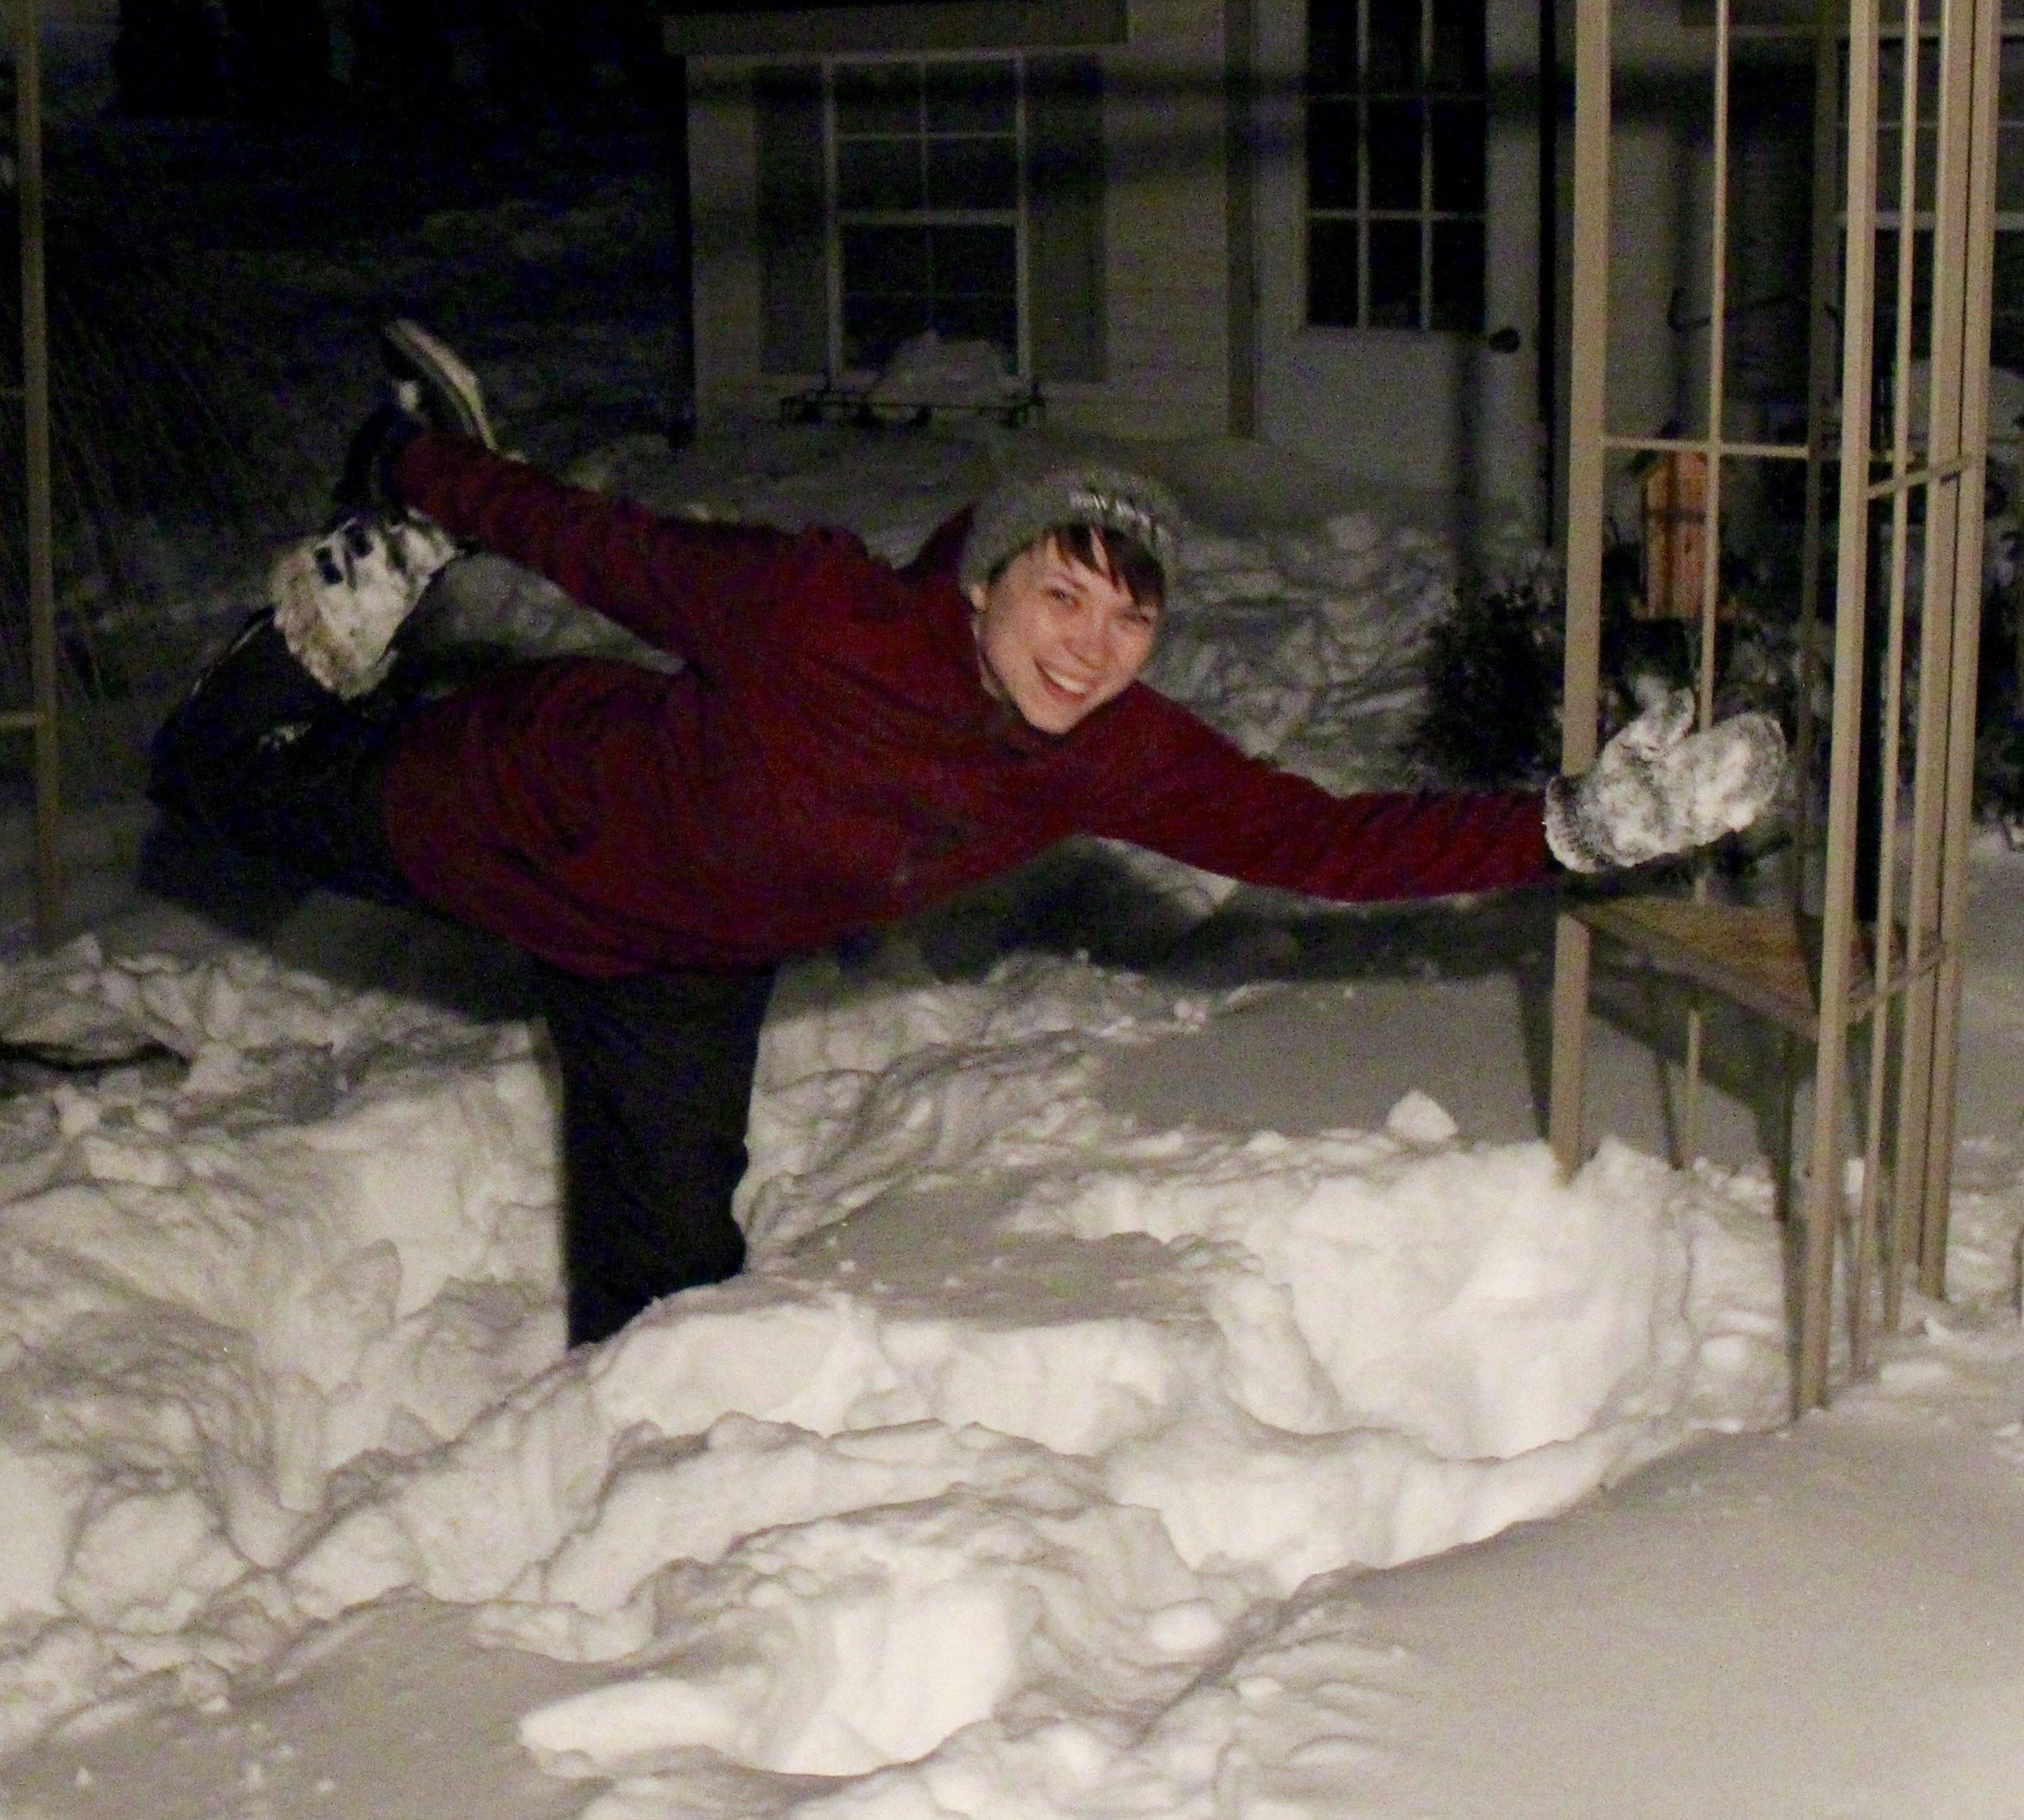 Snowga!!